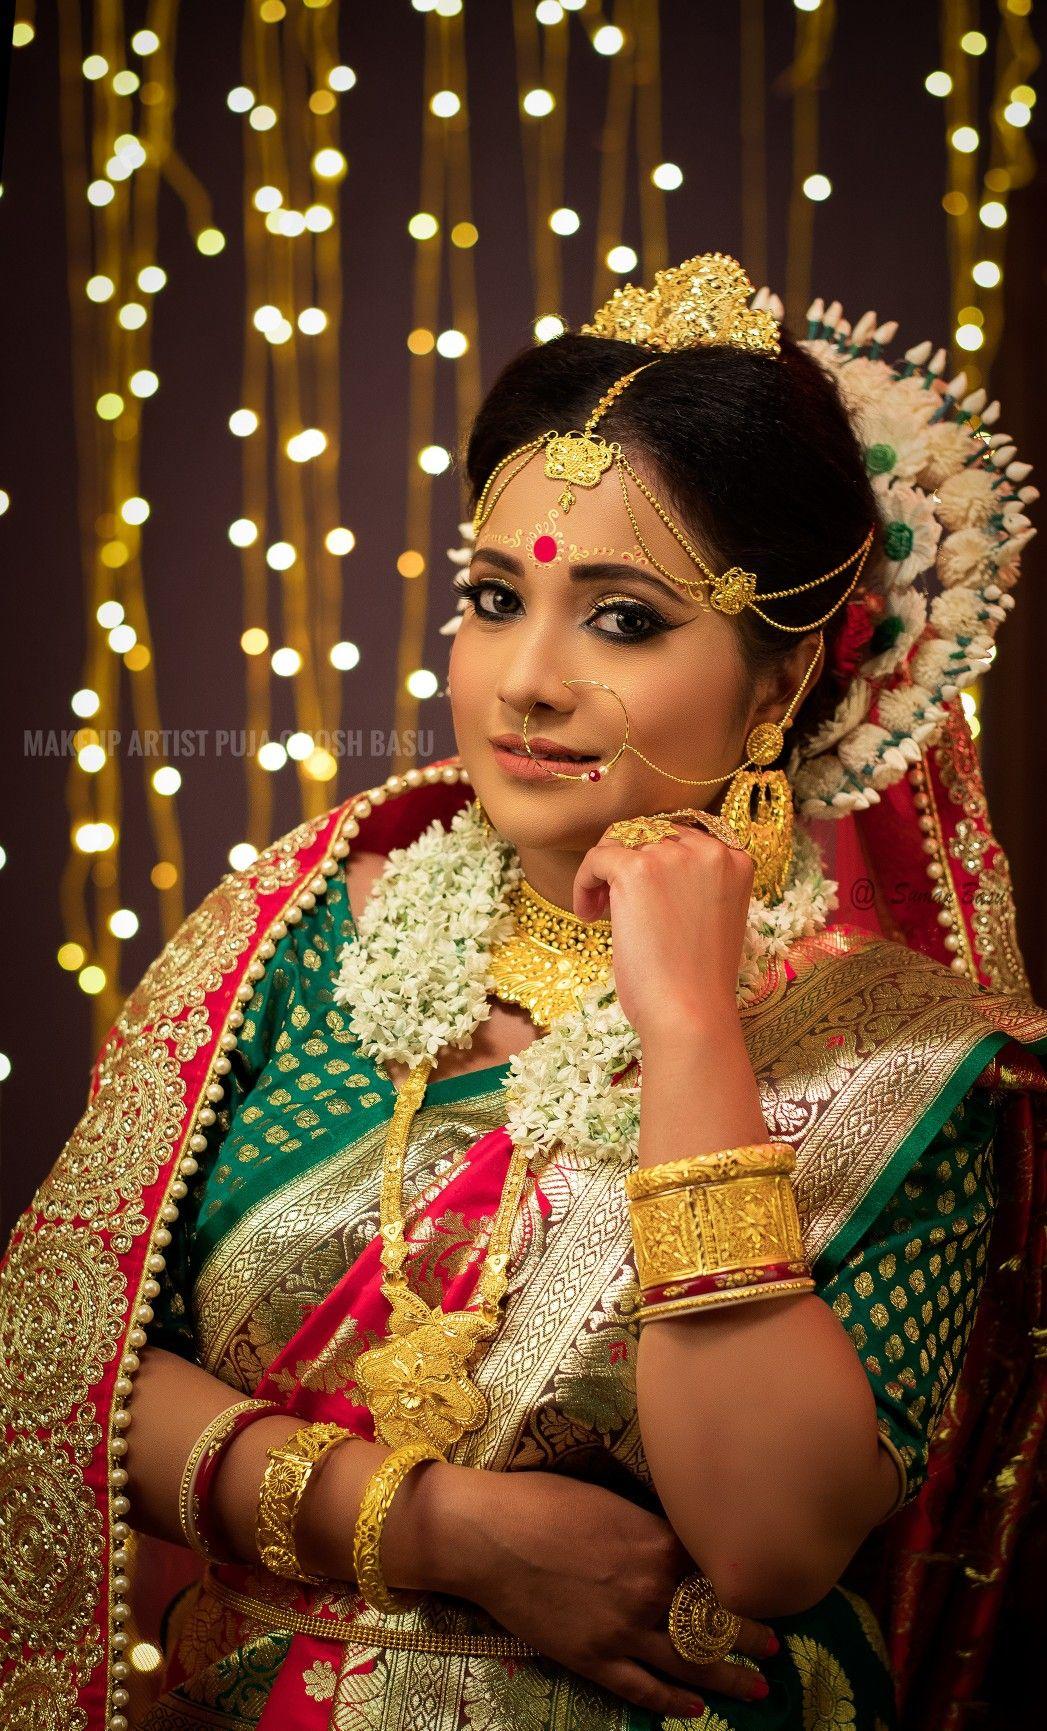 "visit the page "" makeup artist puja ghosh basu "" on facebook"